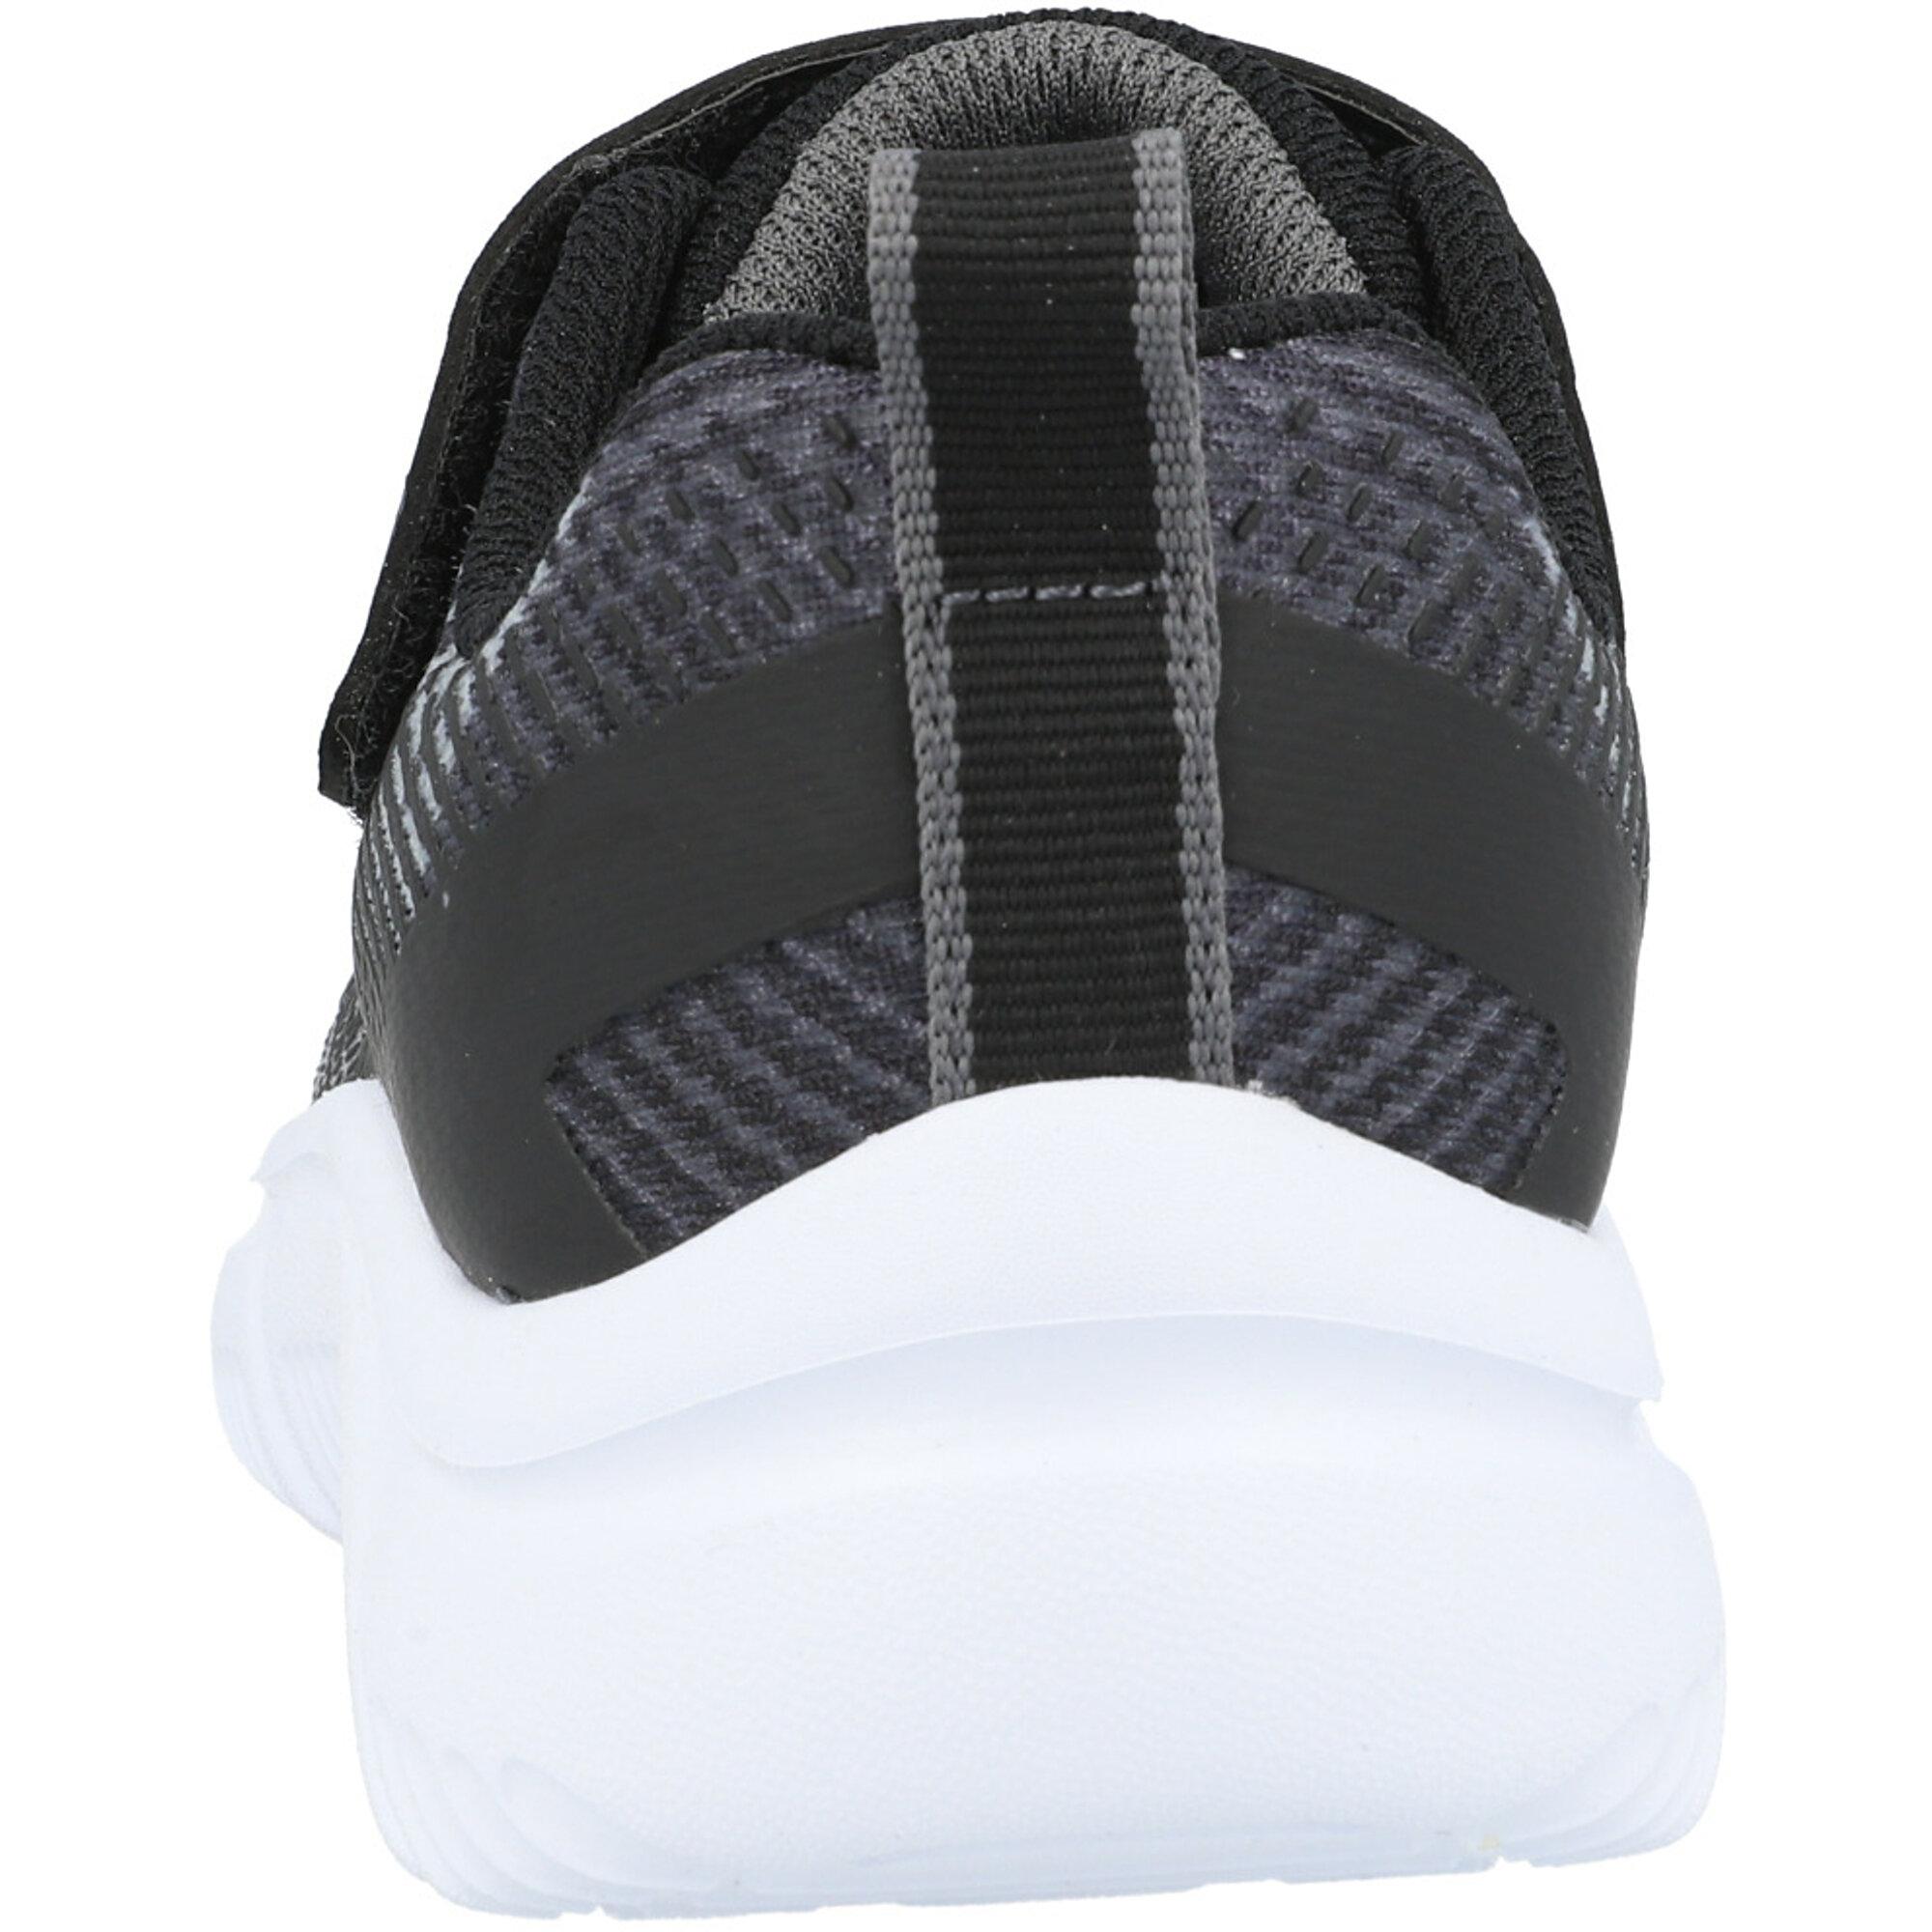 Skechers Go Run 650 Black/Gray Textile